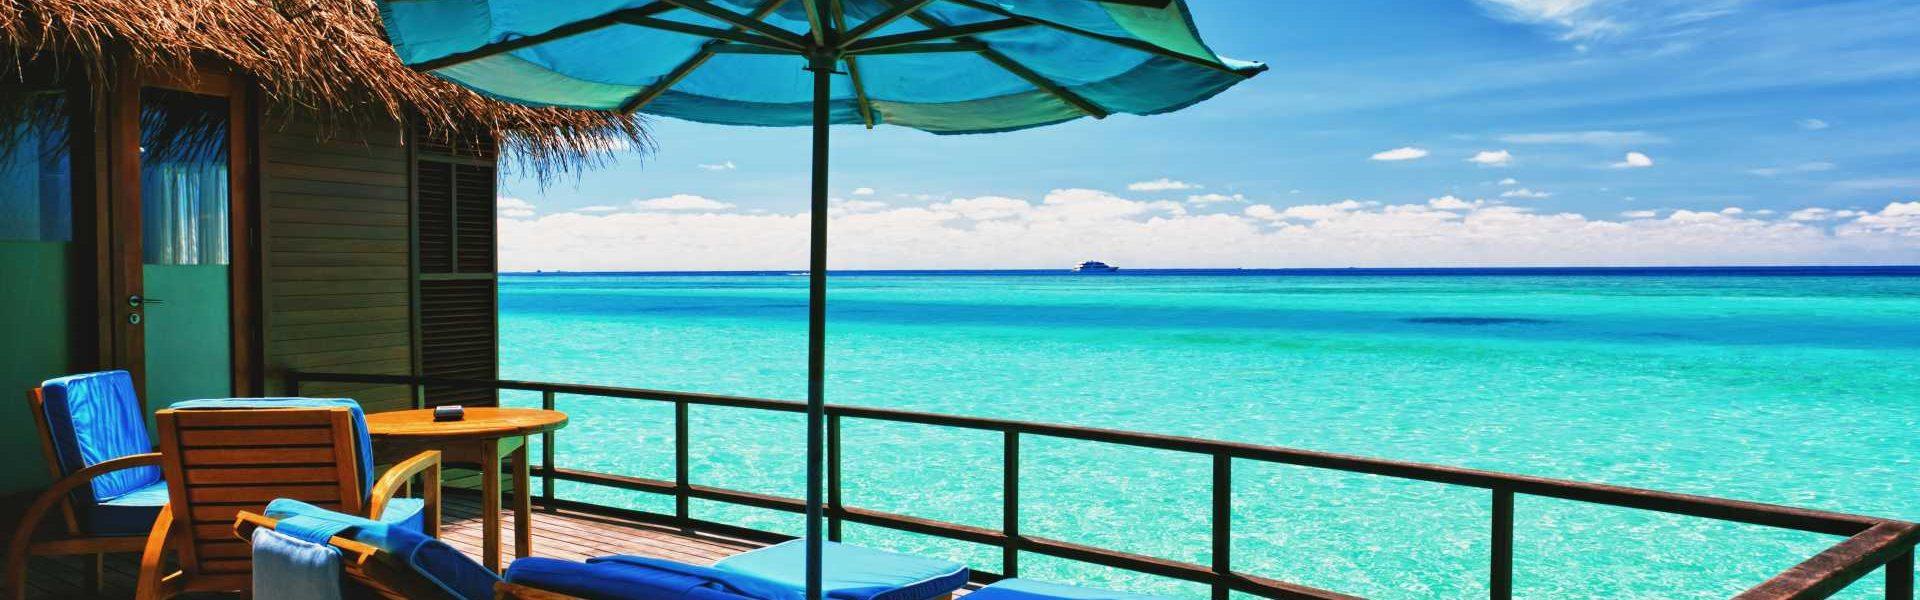 Overwater villa balcony overlooking tropical lagoon